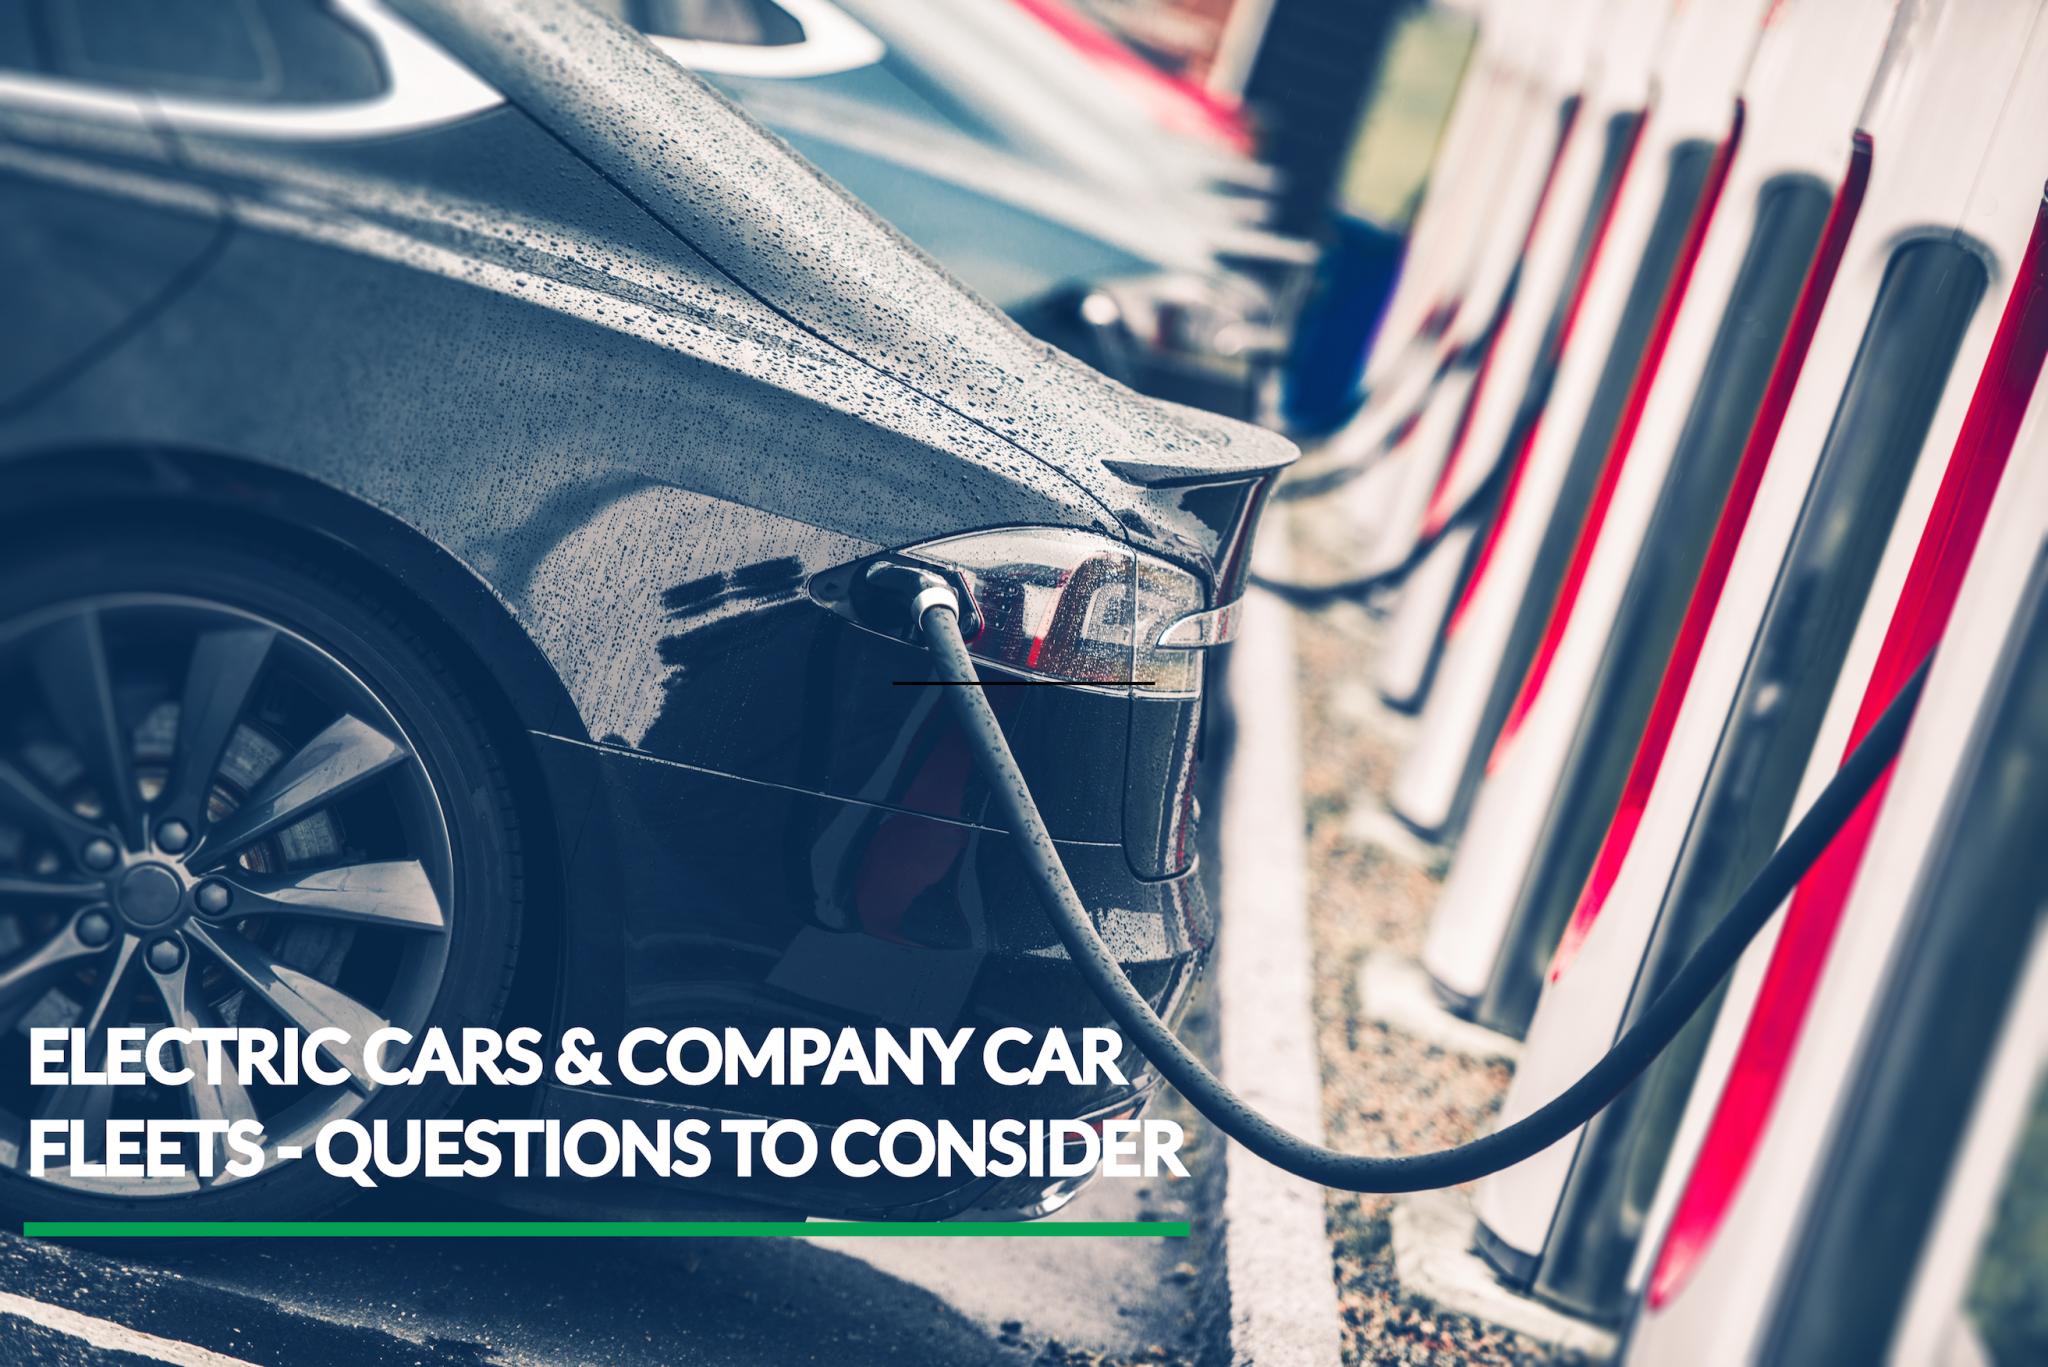 Electric cars & car fleets